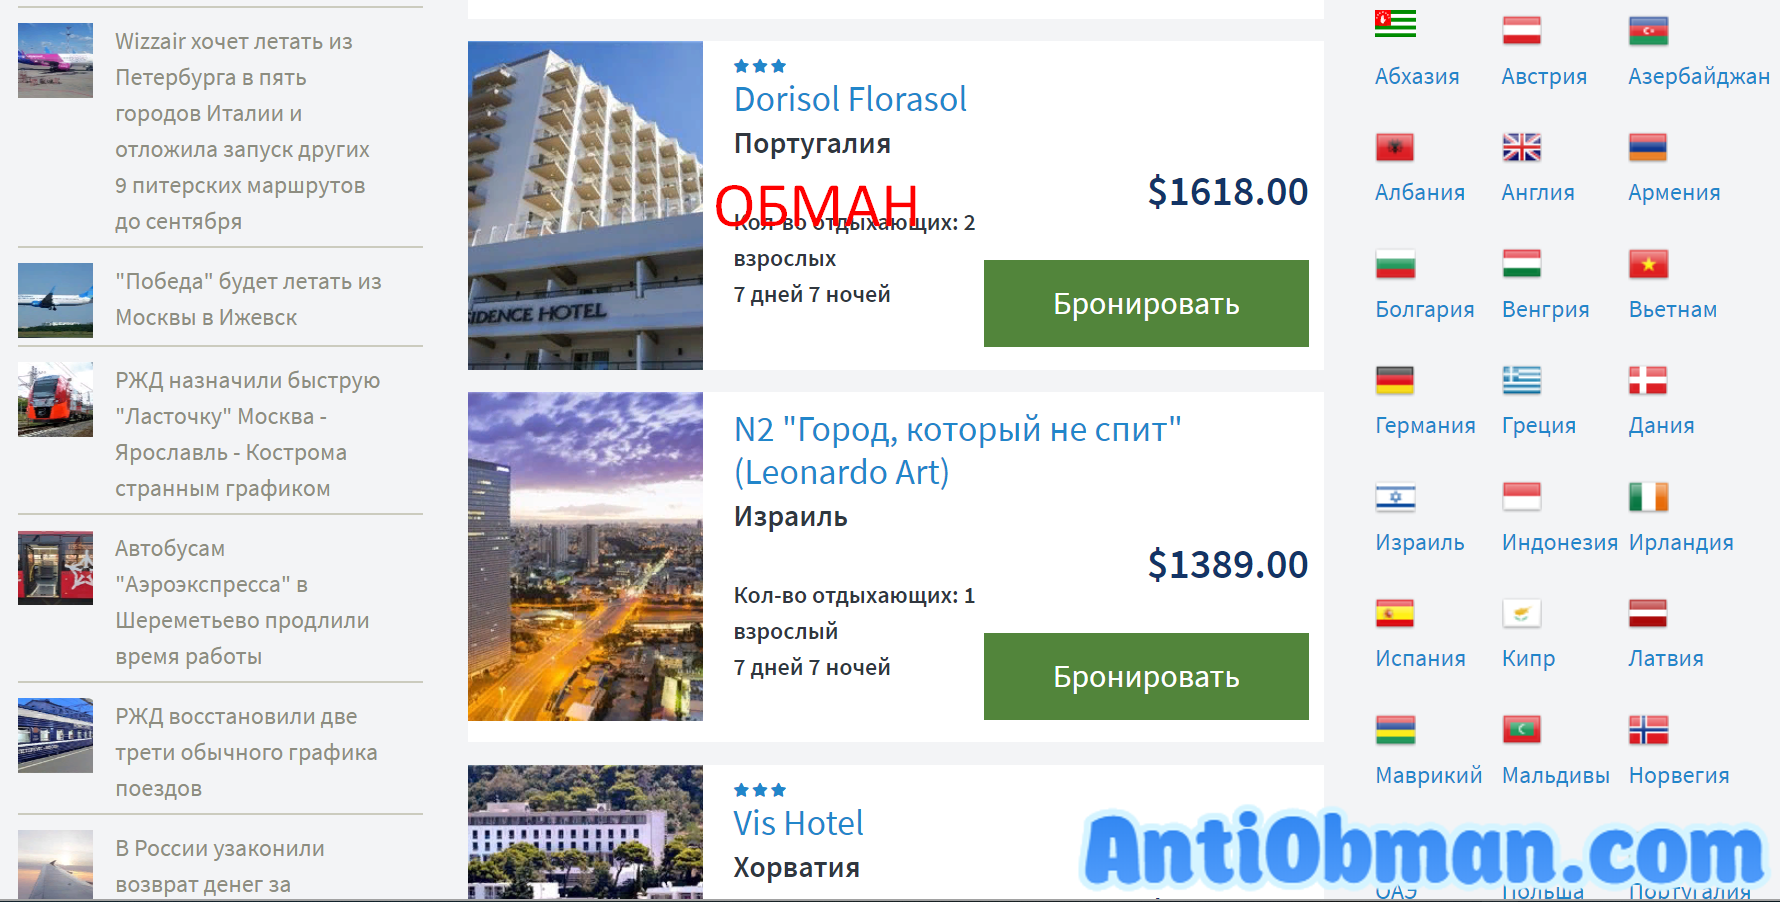 Dreams-Fly - отзывы о компании. Работа в dreams-fly.ru